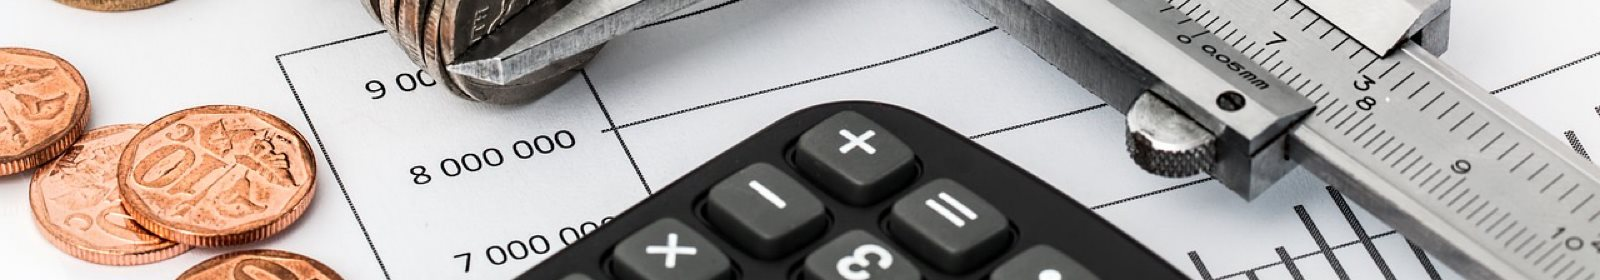 Rental arrears worsen with further decline expected